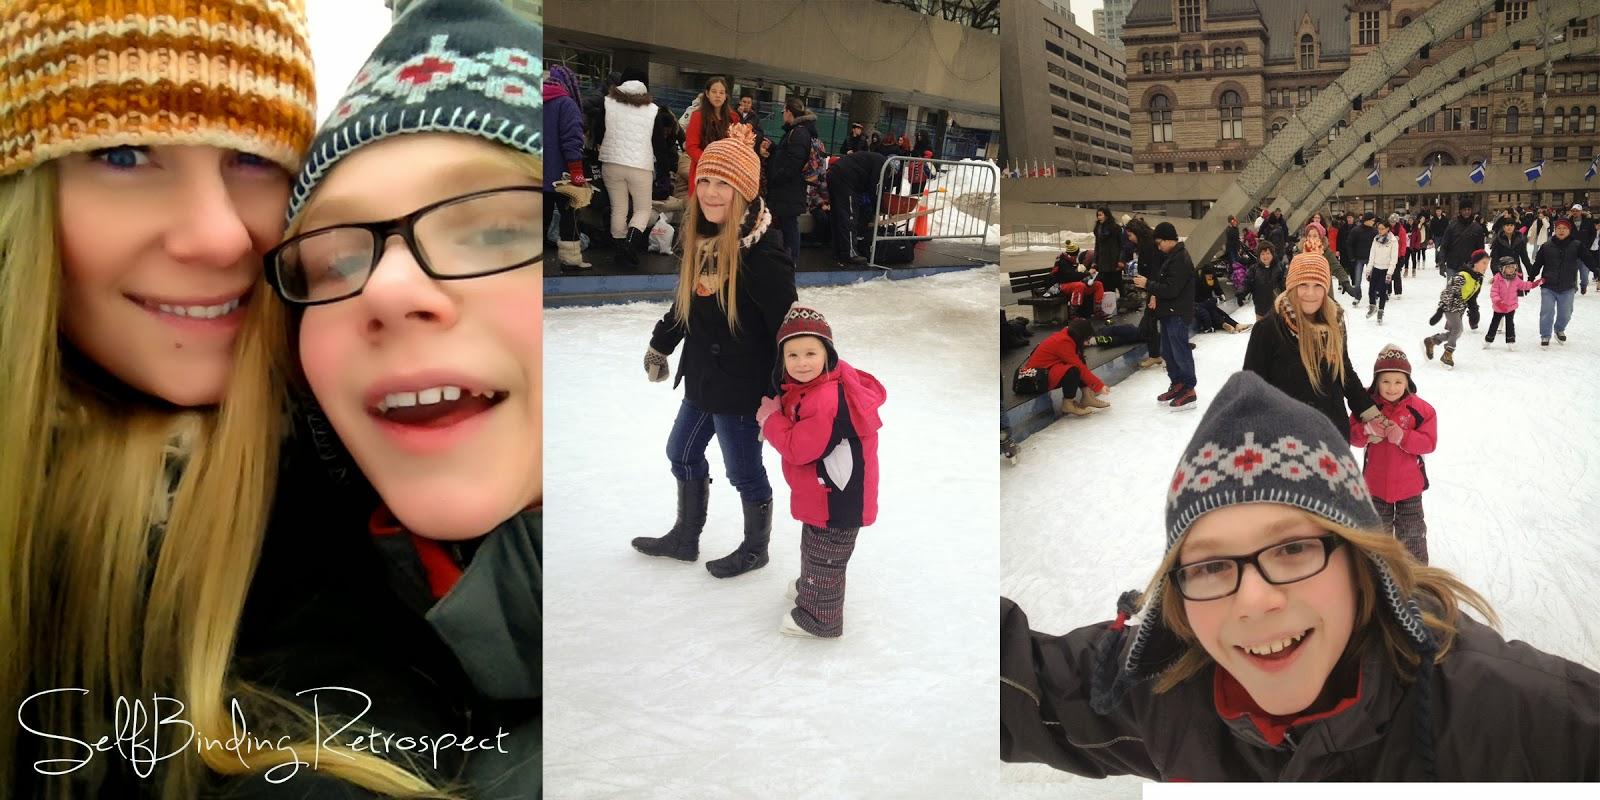 nathan philips square, toronto, ontario, skating